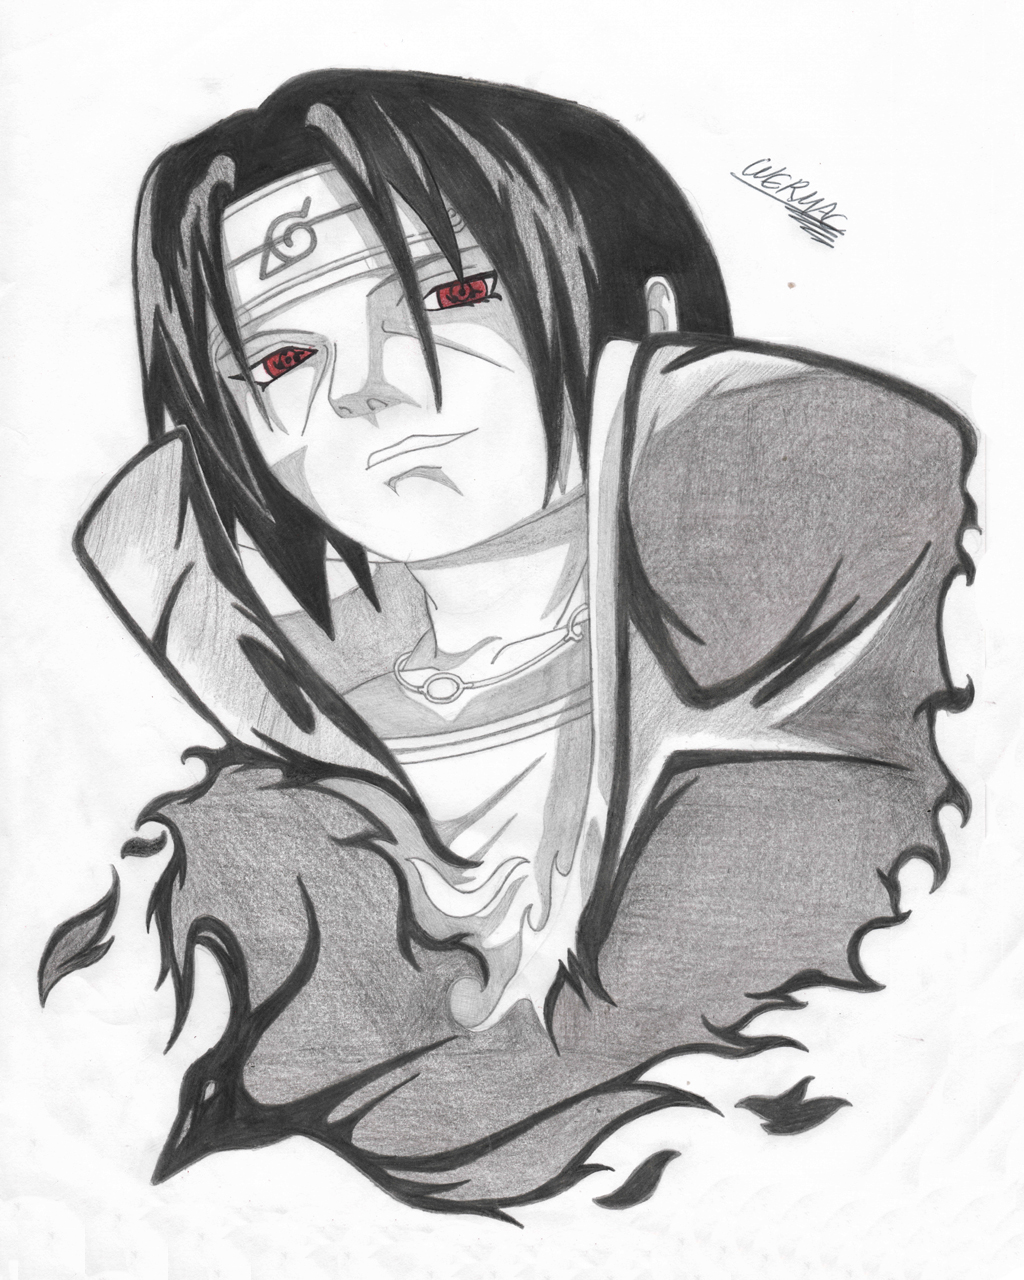 Naruto Shippuden By WermaC On DeviantArt